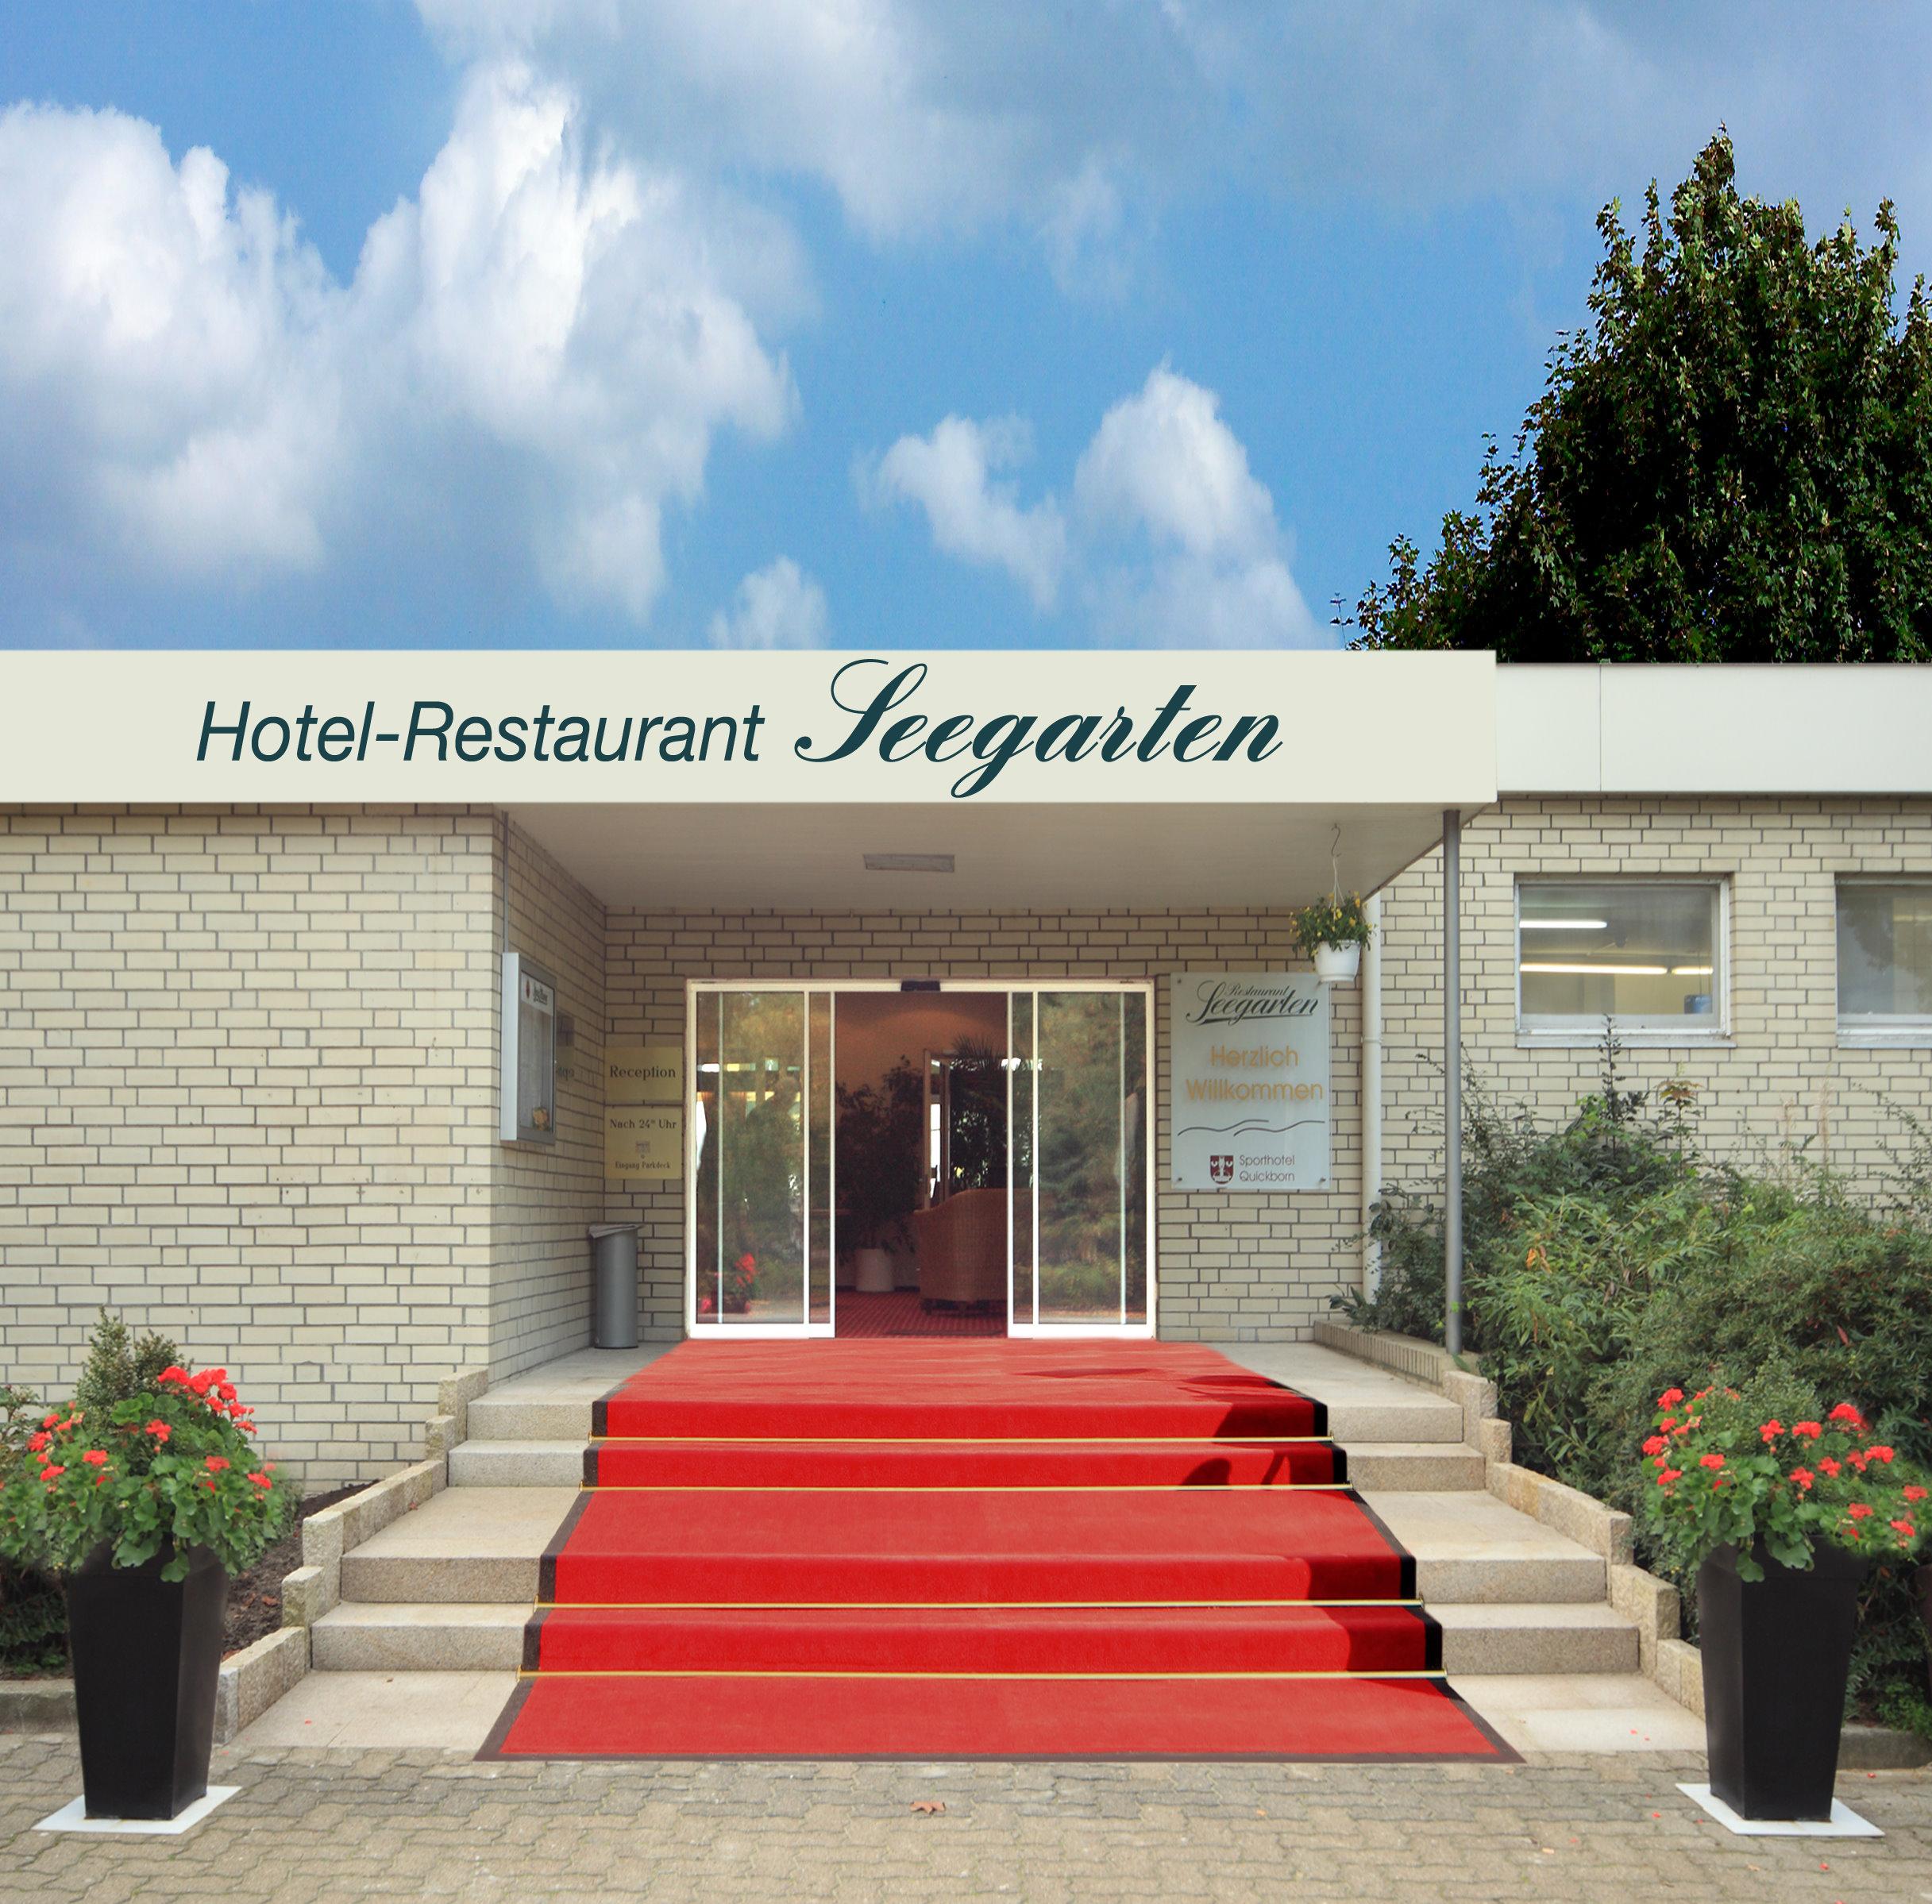 Hotel Seegarten Hamburg